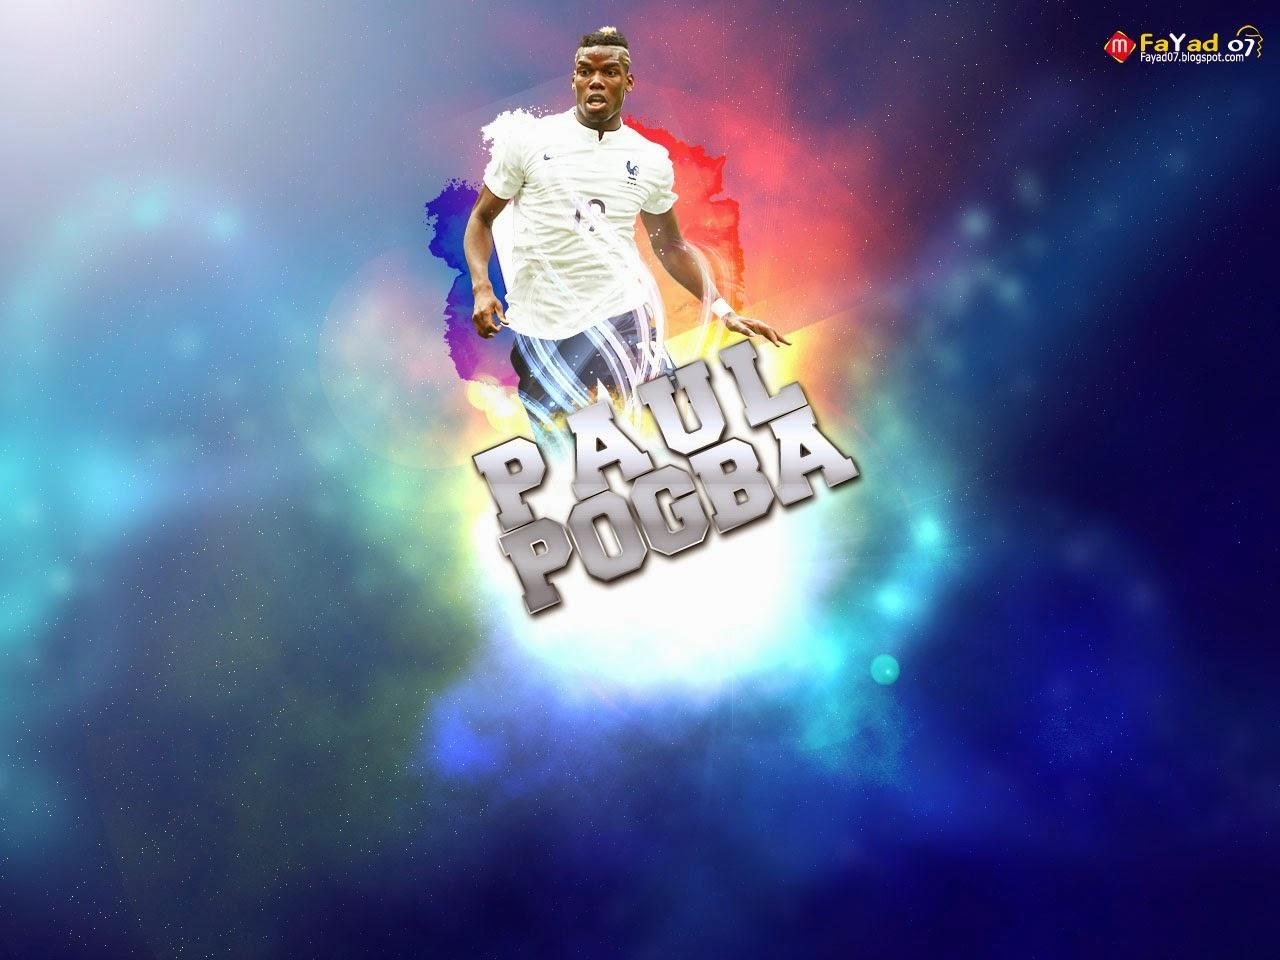 Download Paul Pogba Wallpapers HD Wallpaper